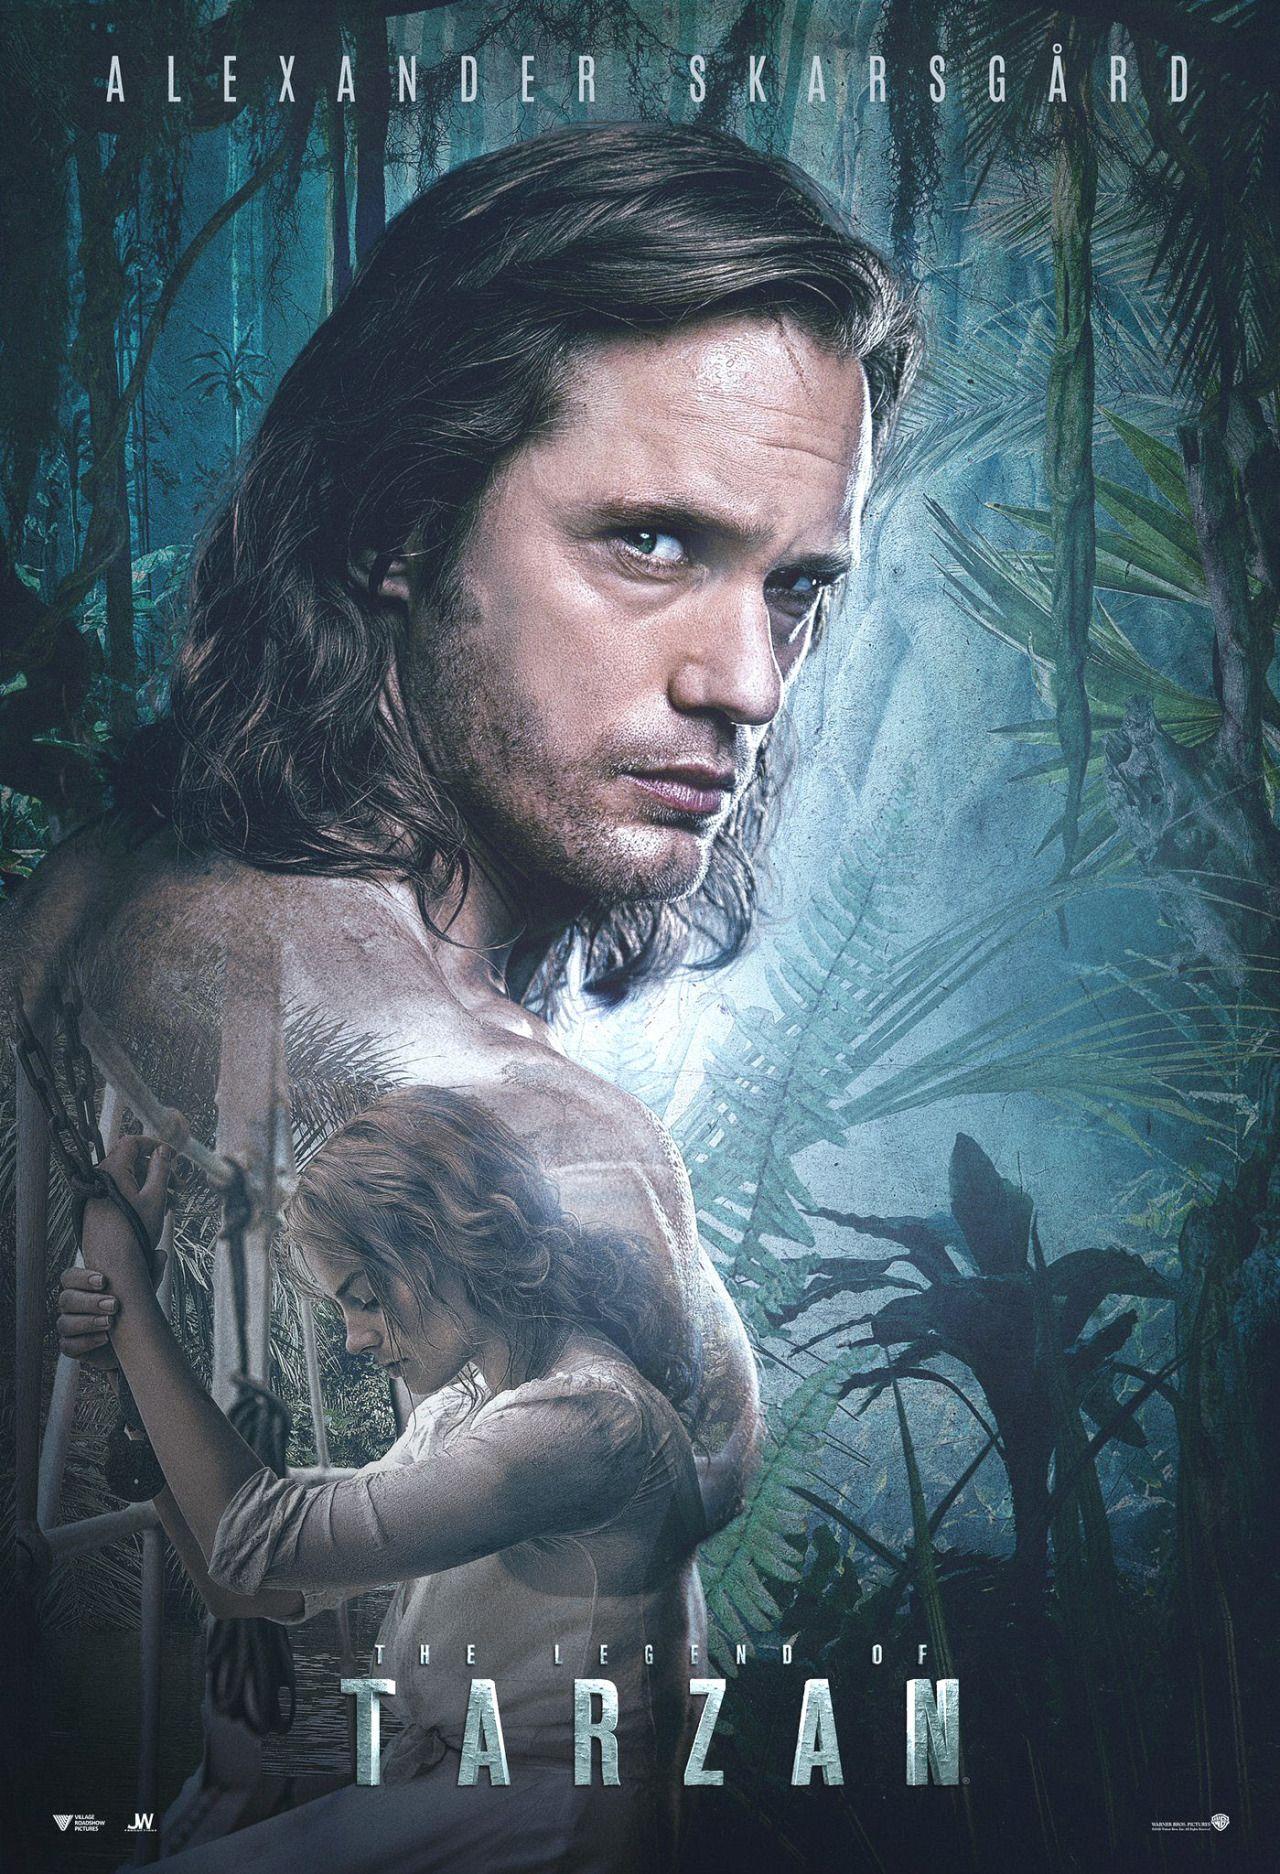 The legend of tarzan alexander skarsgard pinterest - Tarzan pelicula completa ...